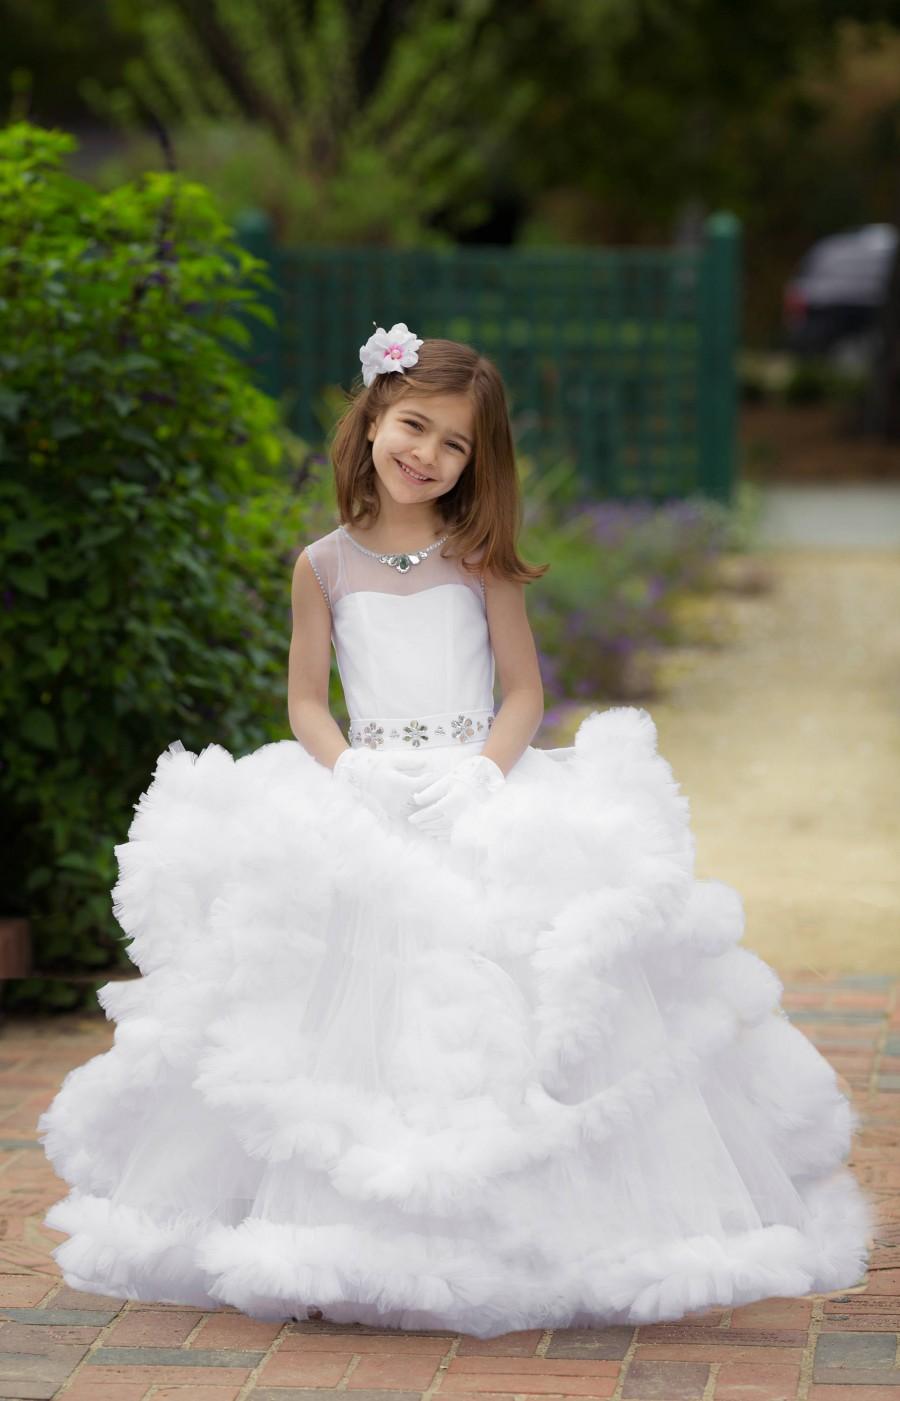 White Flower Girl Dress White Wedding Princess Dress Ruffle Dress ...